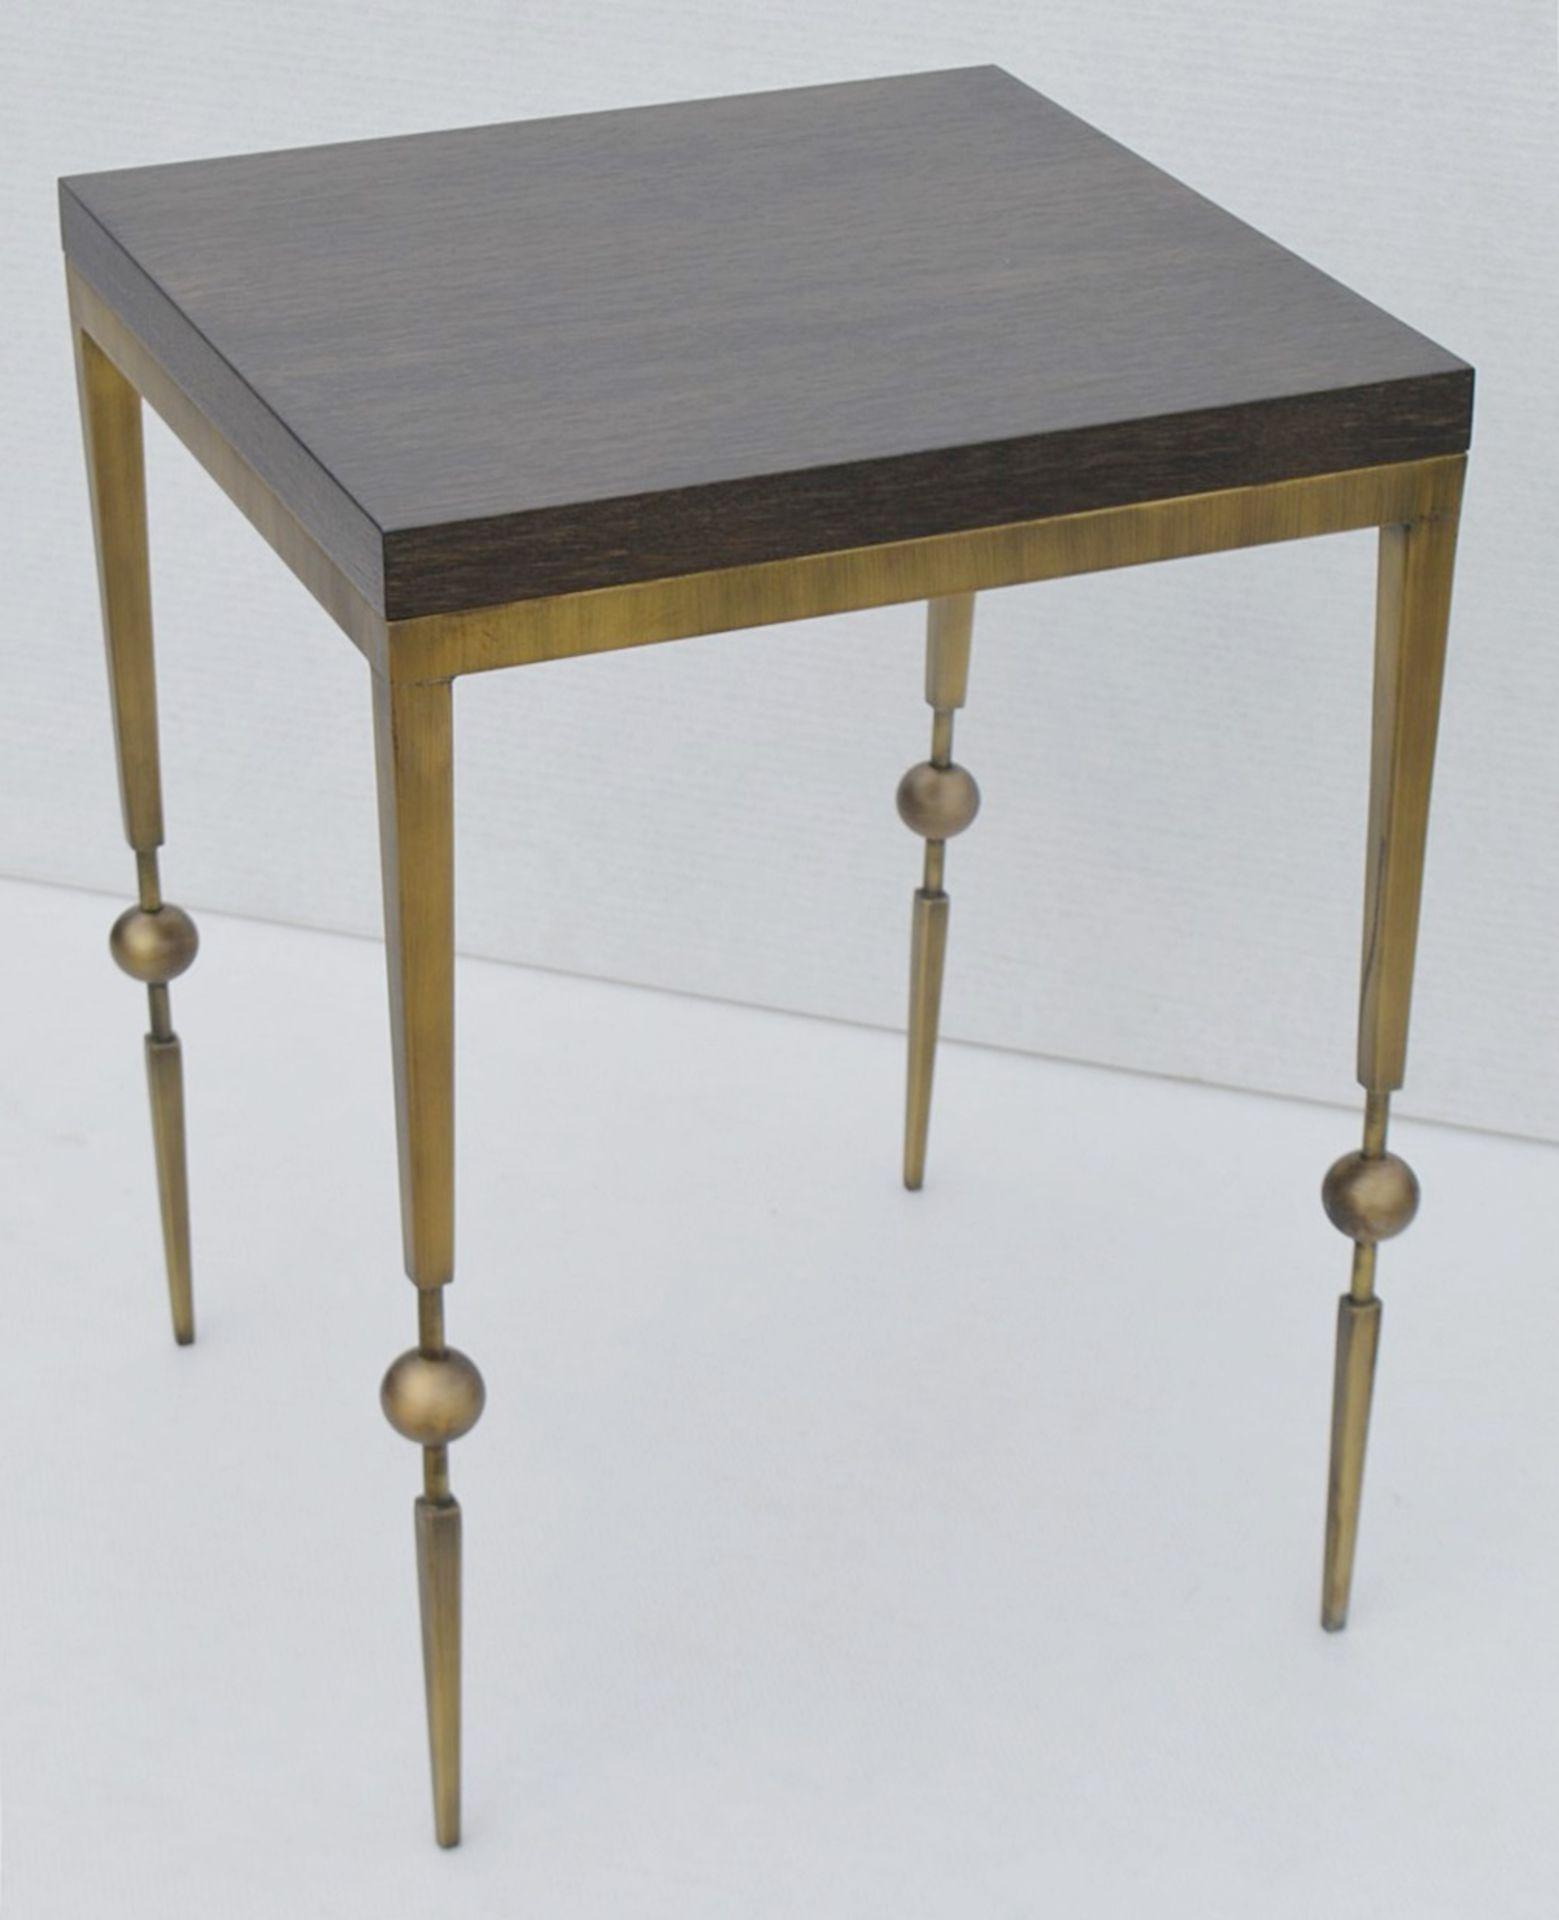 1 x JUSTIN VAN BREDA 'Sphere' Designer Occasional Table - Dimensions: H70 x W52 x D52cm - Ref: